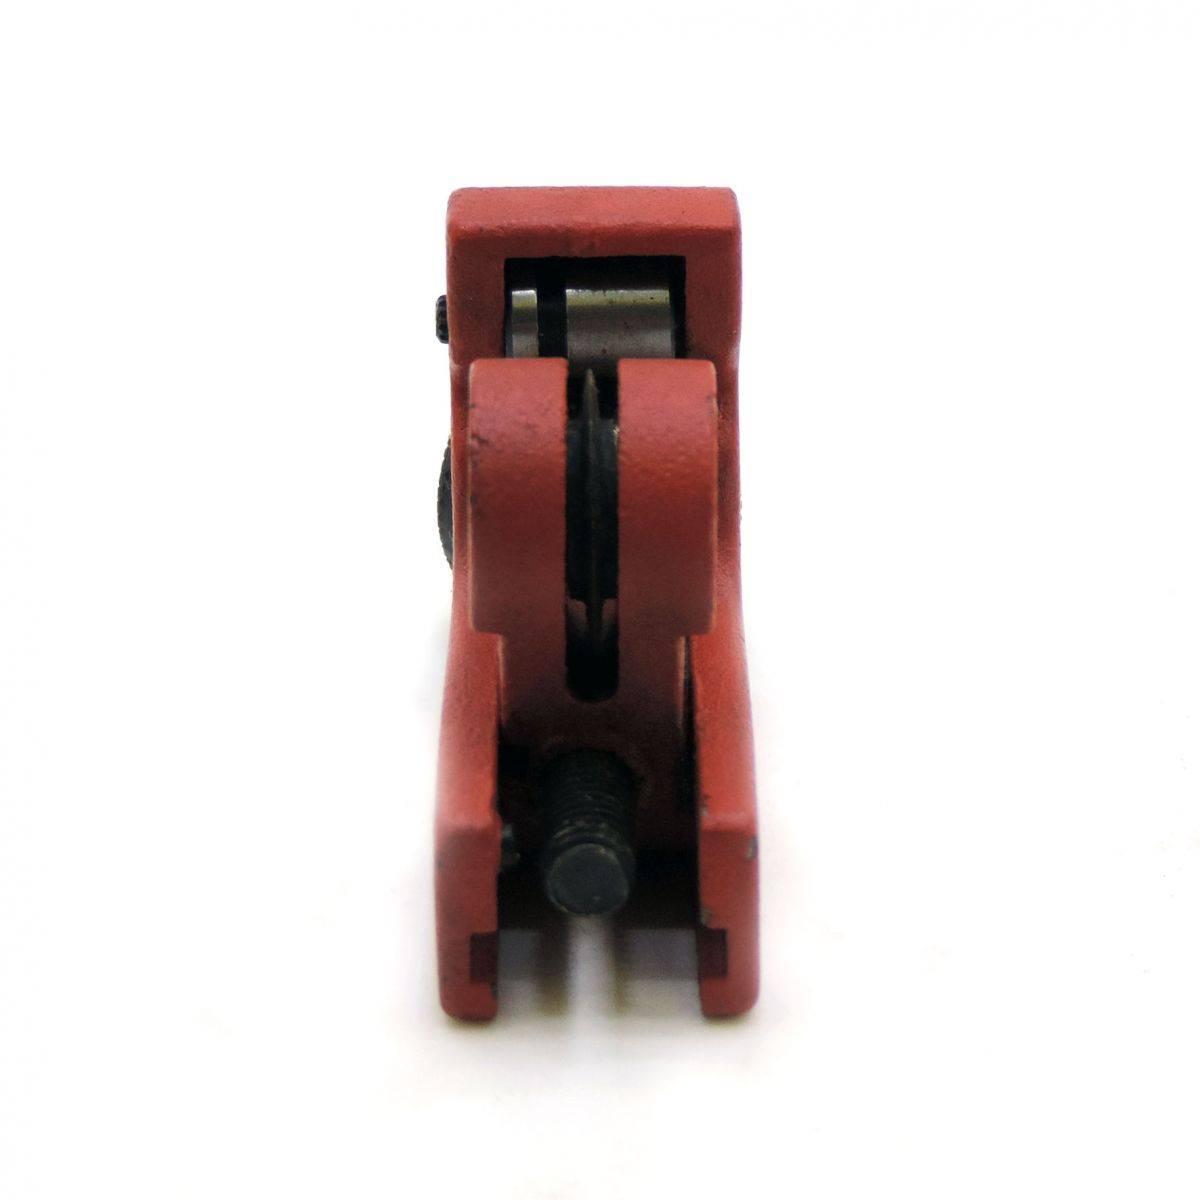 Ferramenta Corta Tubos P/ Cobre Ega Master 22 Mini 63106 U80